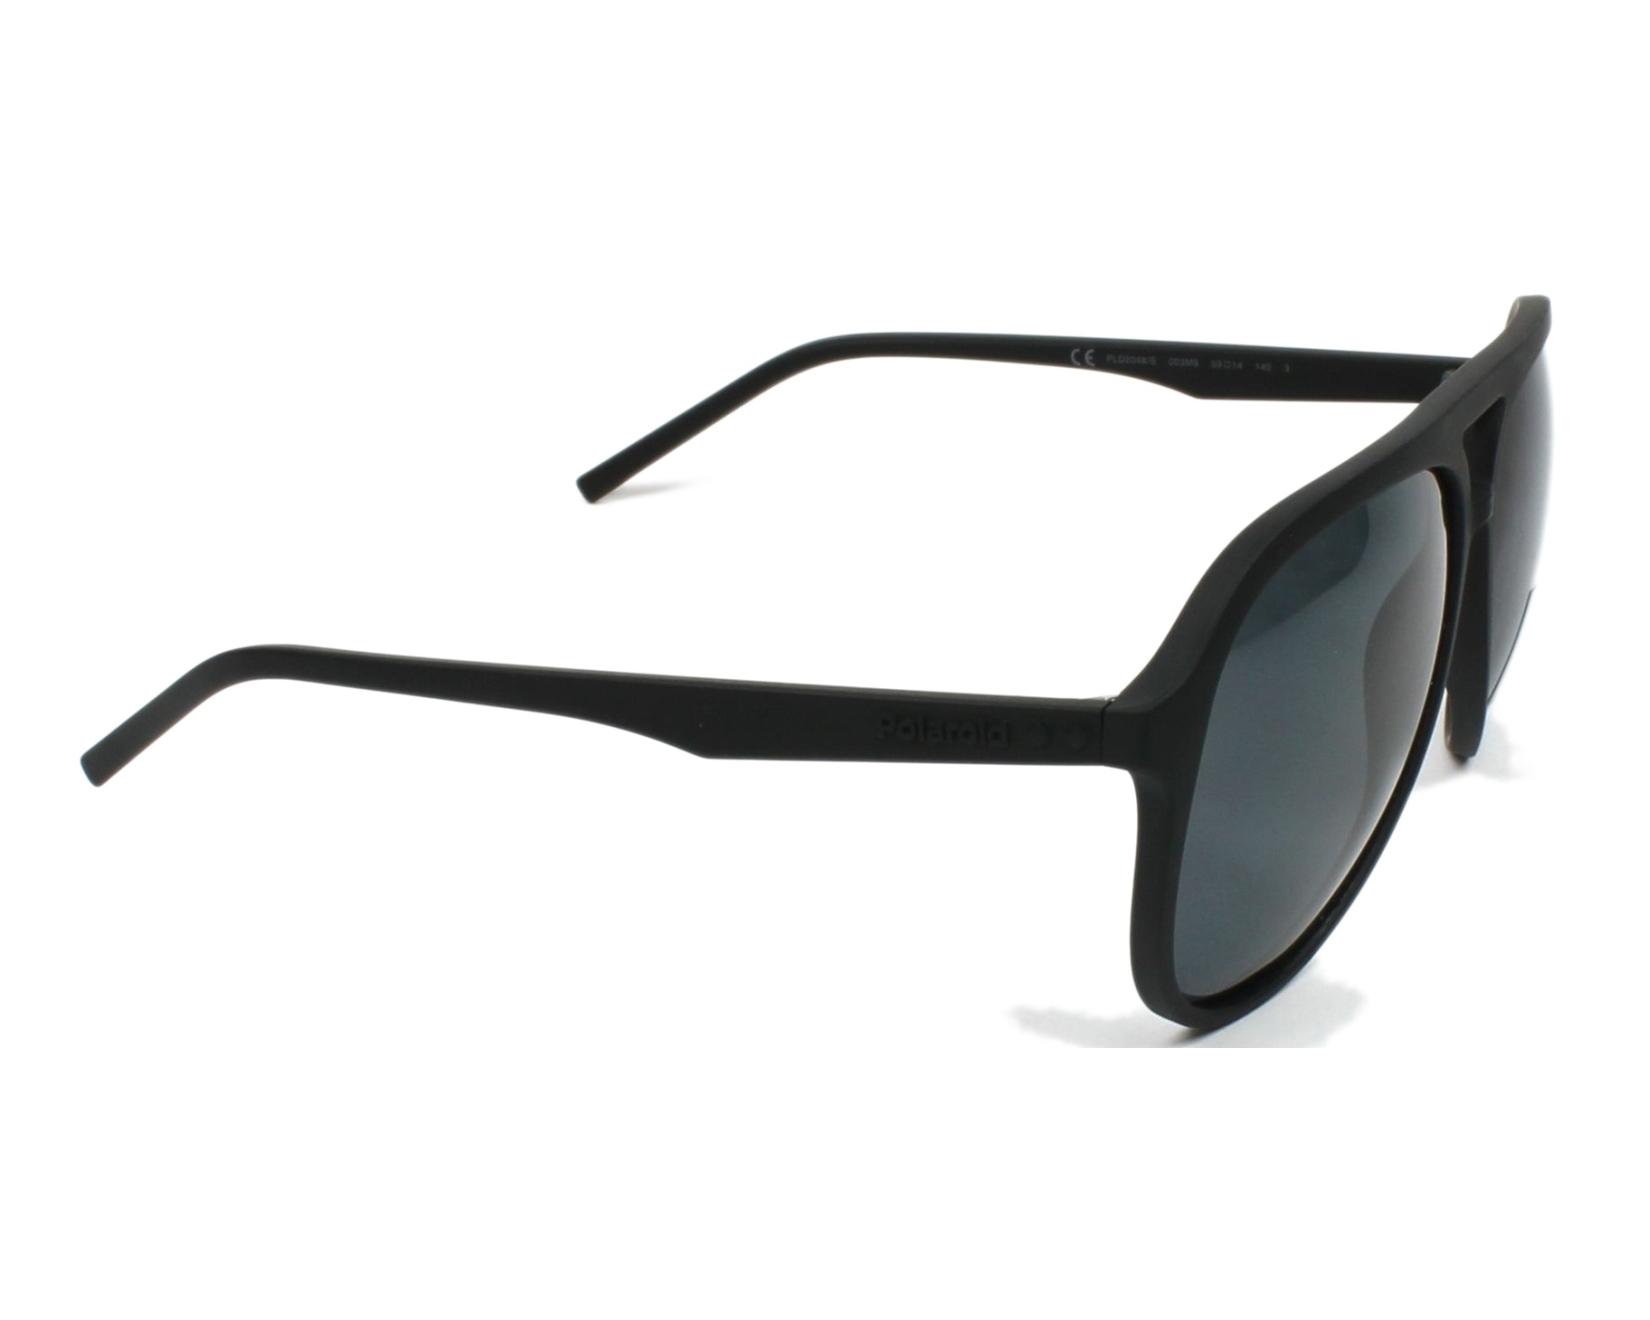 a33cd438d98d thumbnail Sunglasses Polaroid PLD-2048-S 003 M9 - Black side view